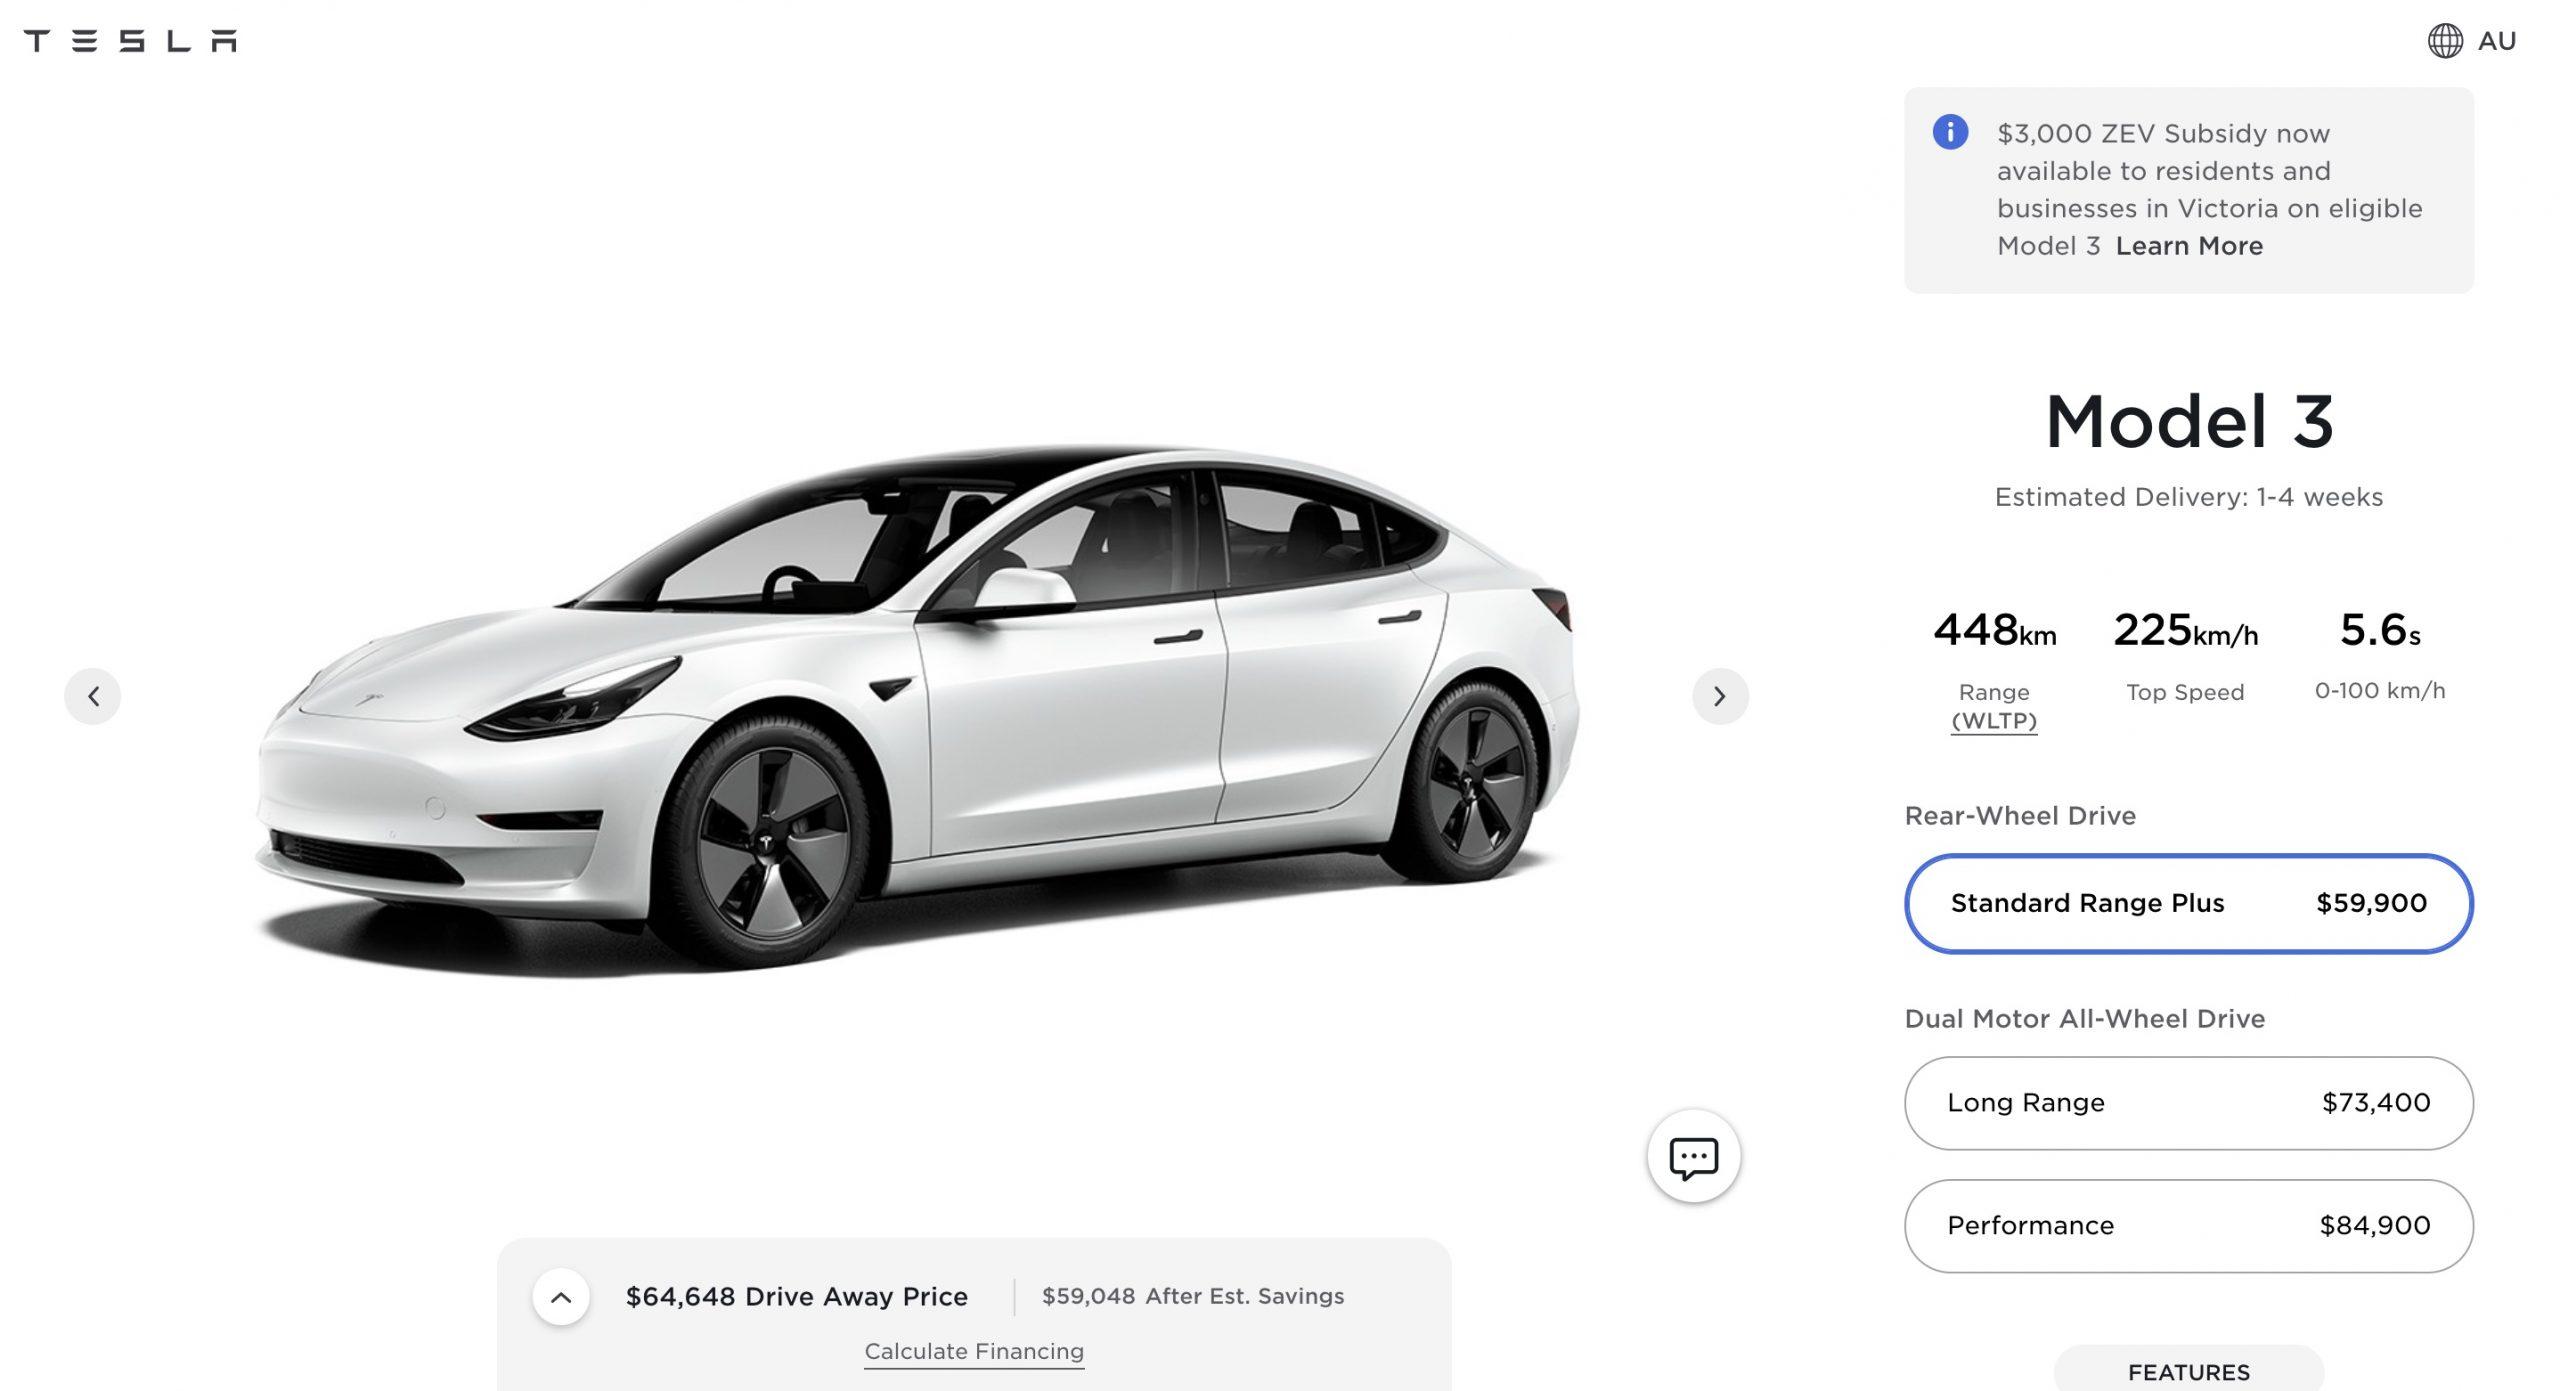 tesla-model-3-australia-price-drop-